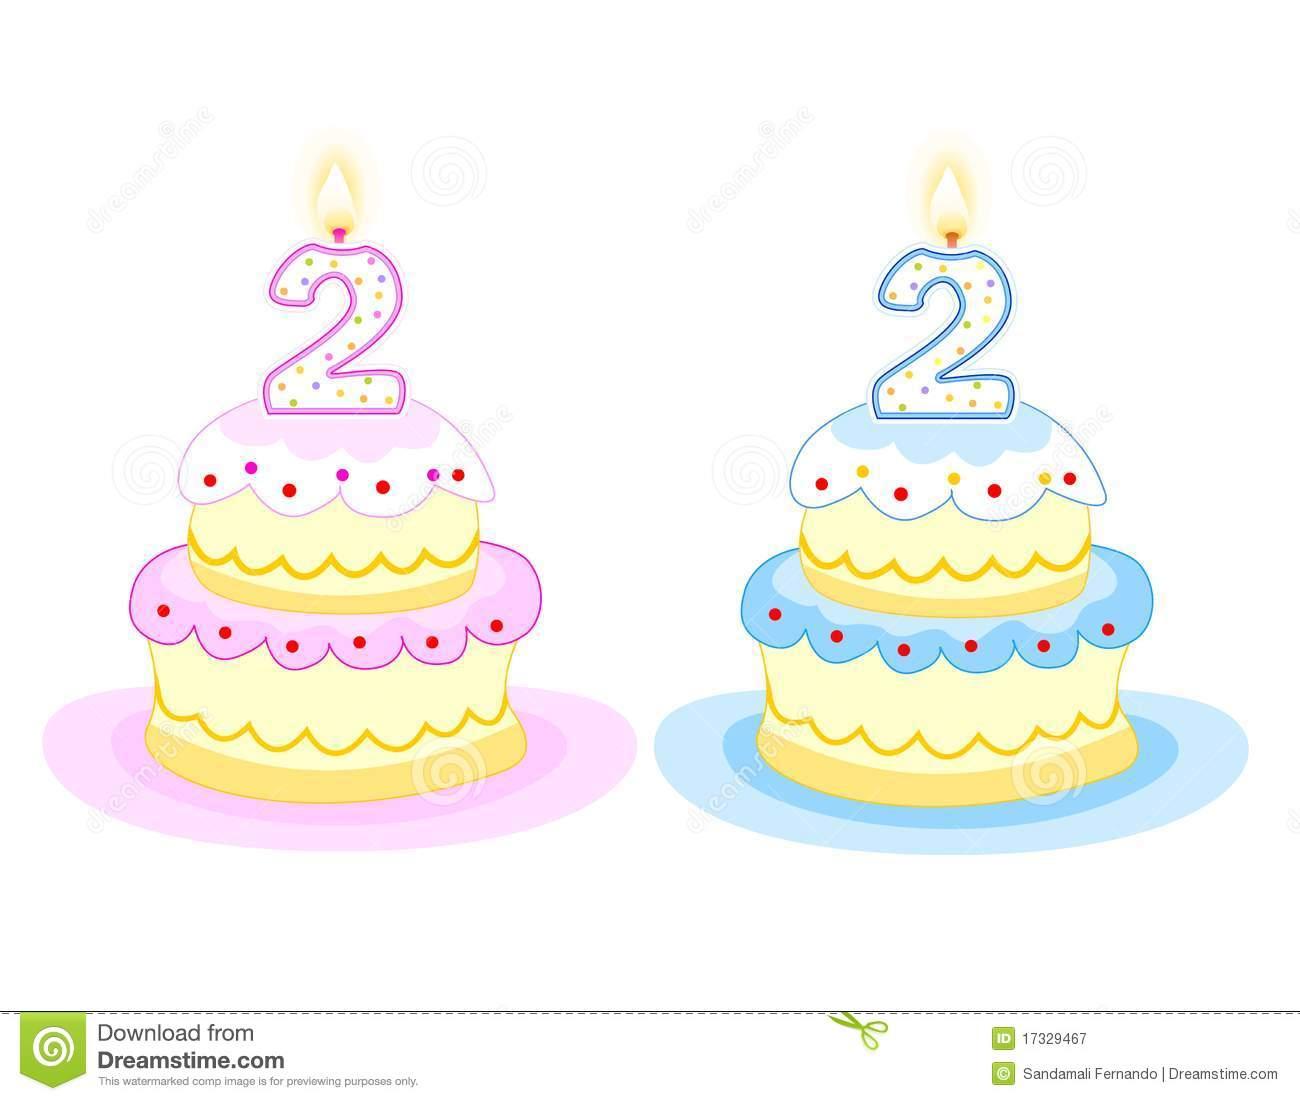 2nd birthday cake clipart vector 2nd birthday cake clipart - ClipartFest vector